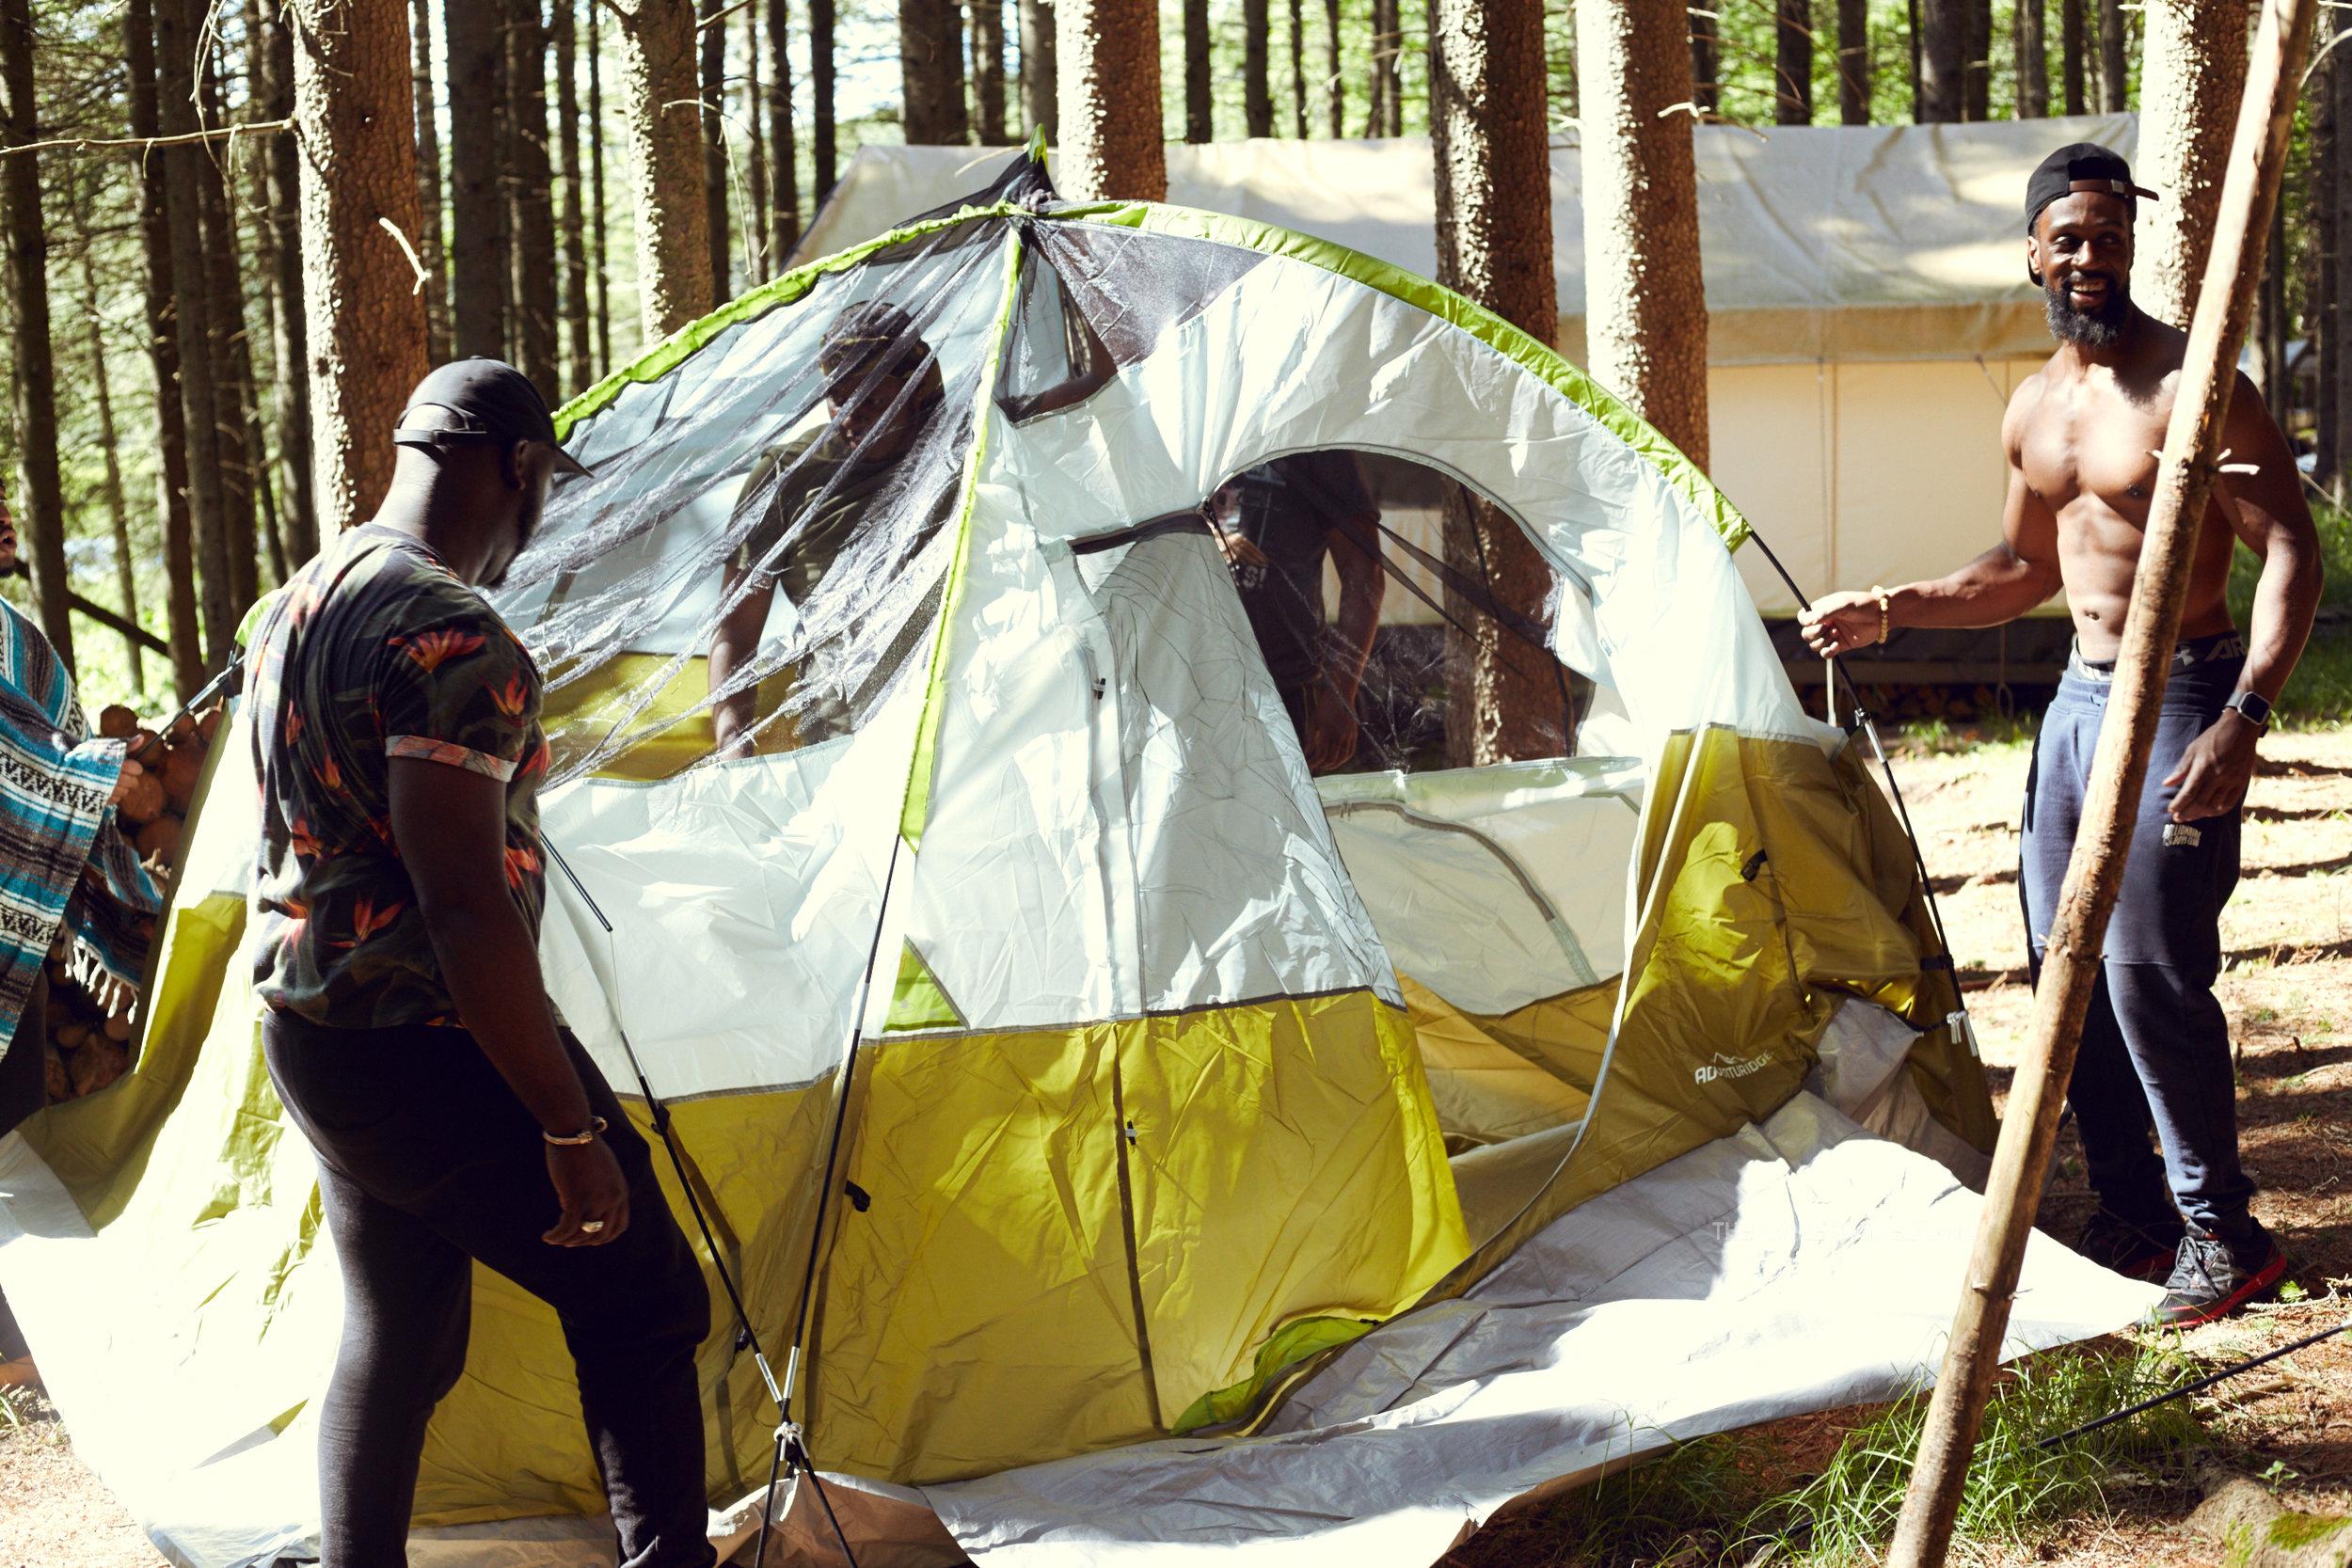 170625_Mastermind Camping_018.jpg